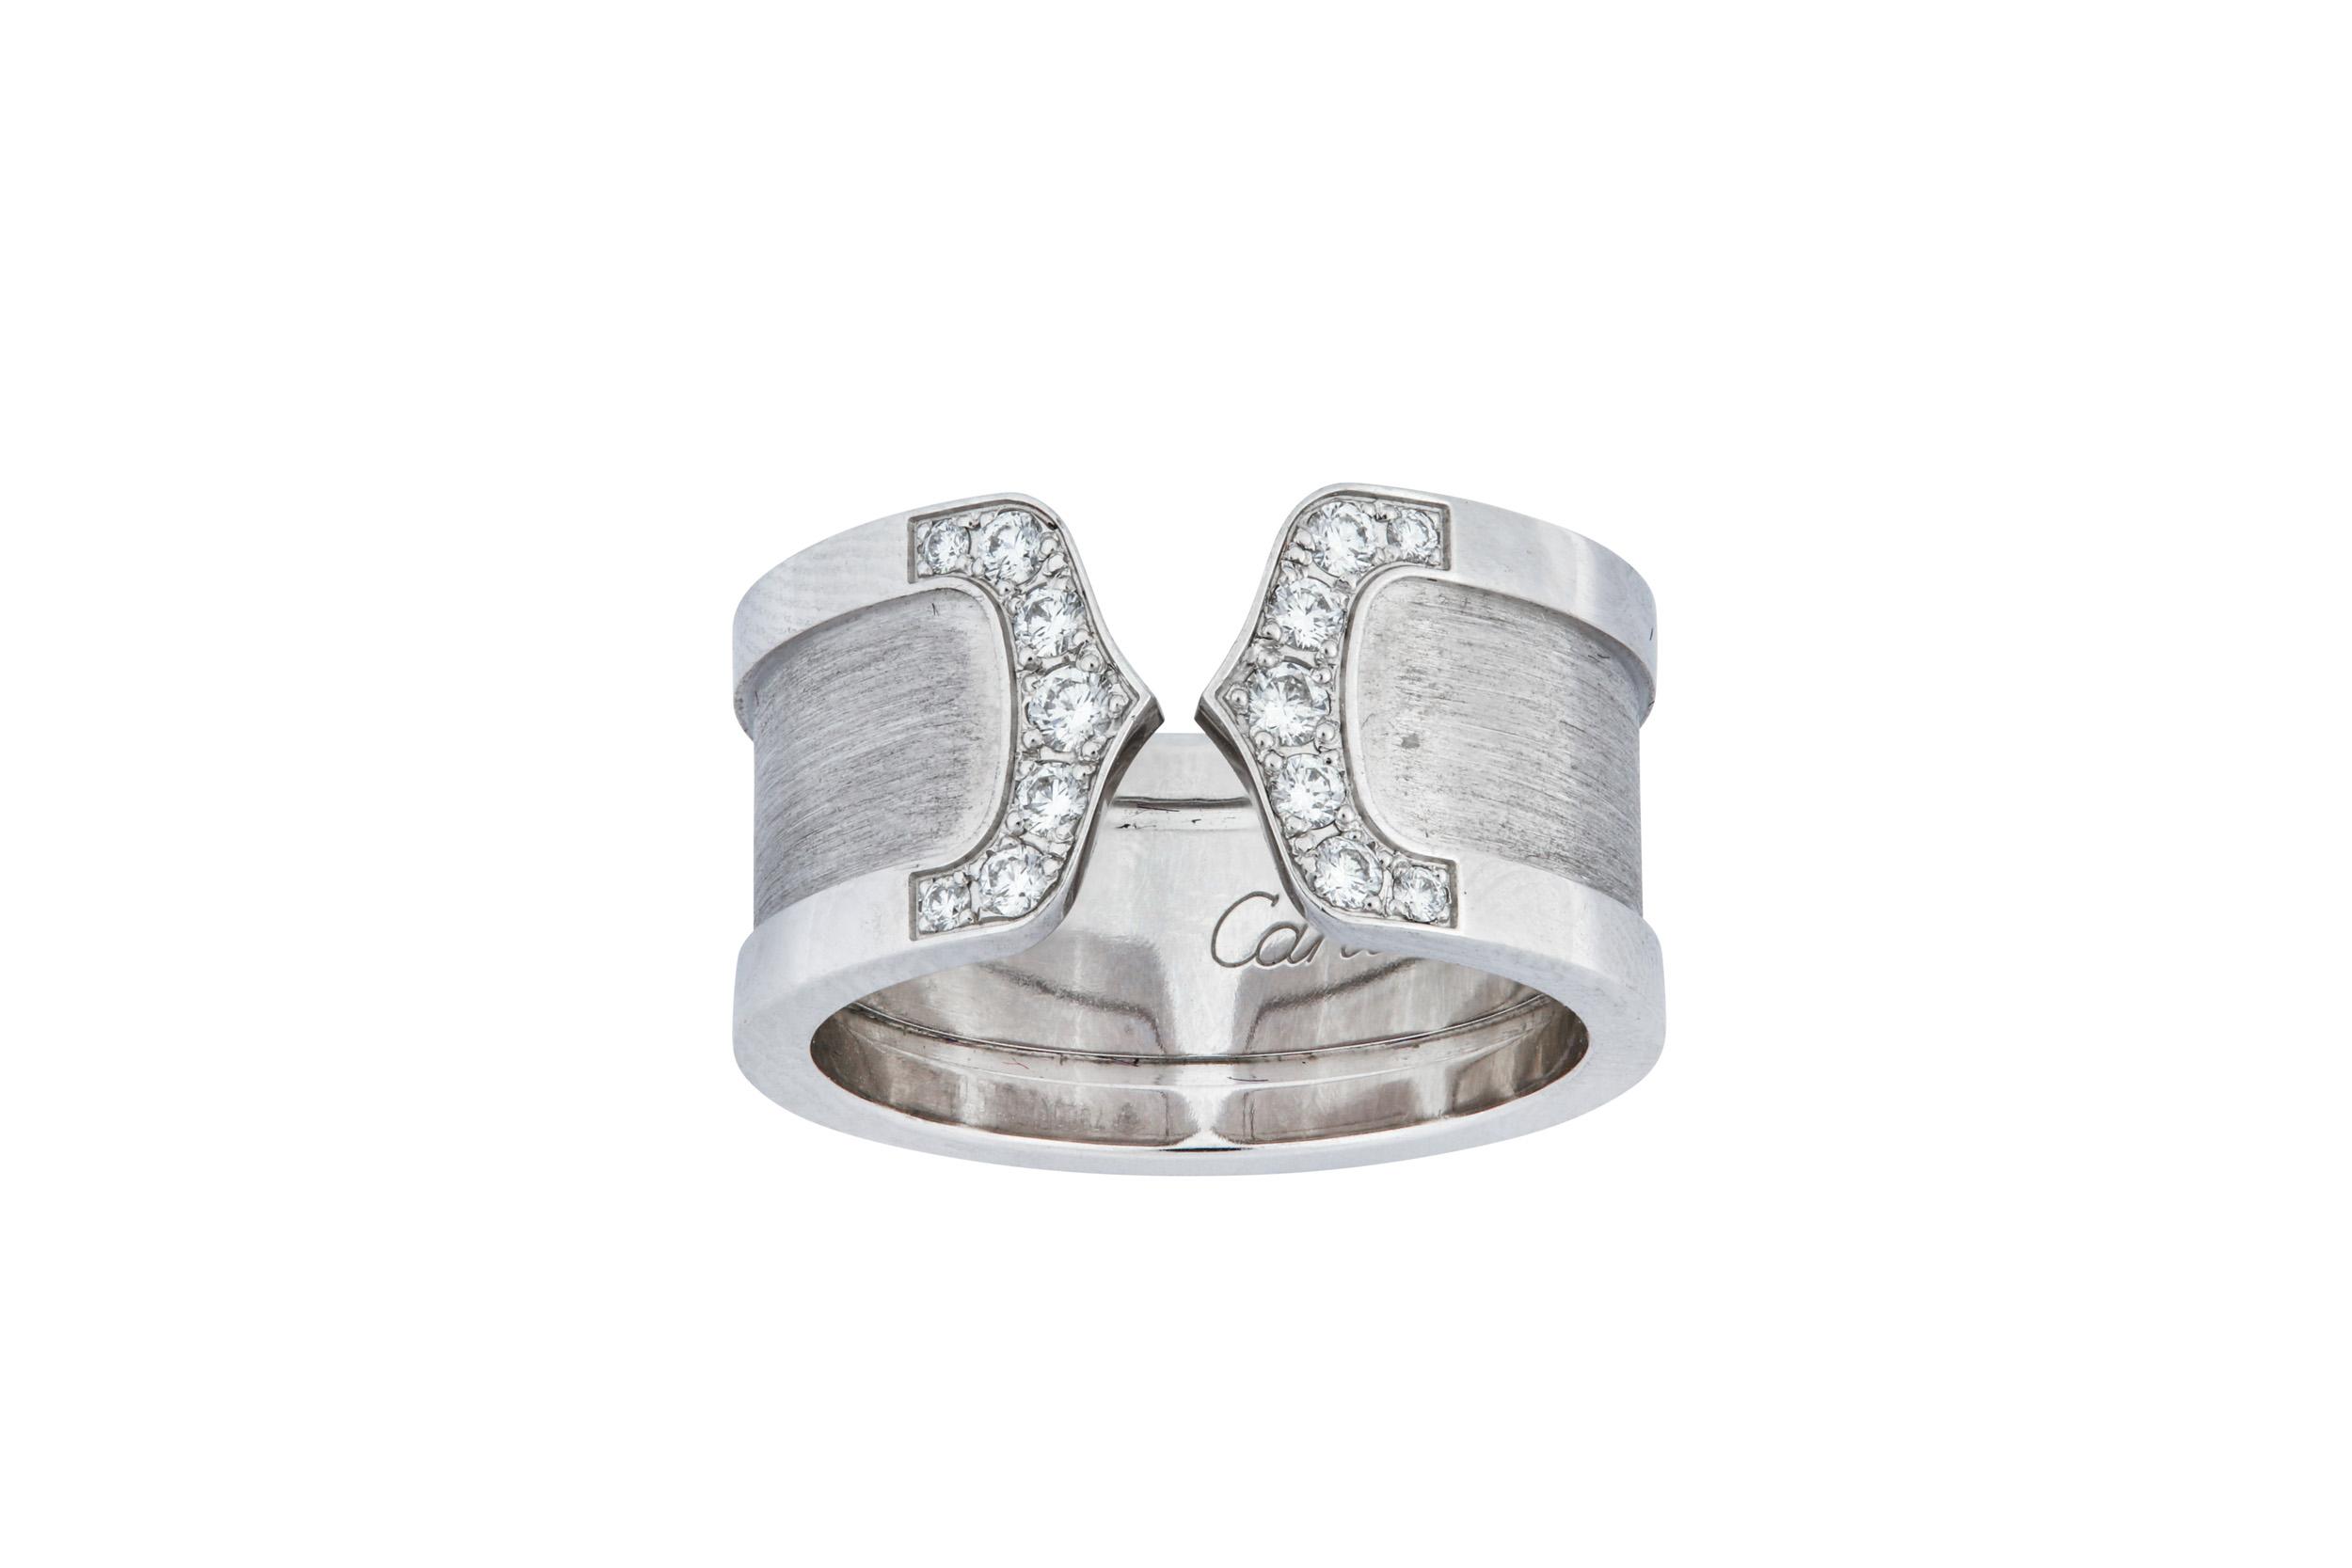 Lot 10 - A diamond-set 'Logo' ring, by Cartier